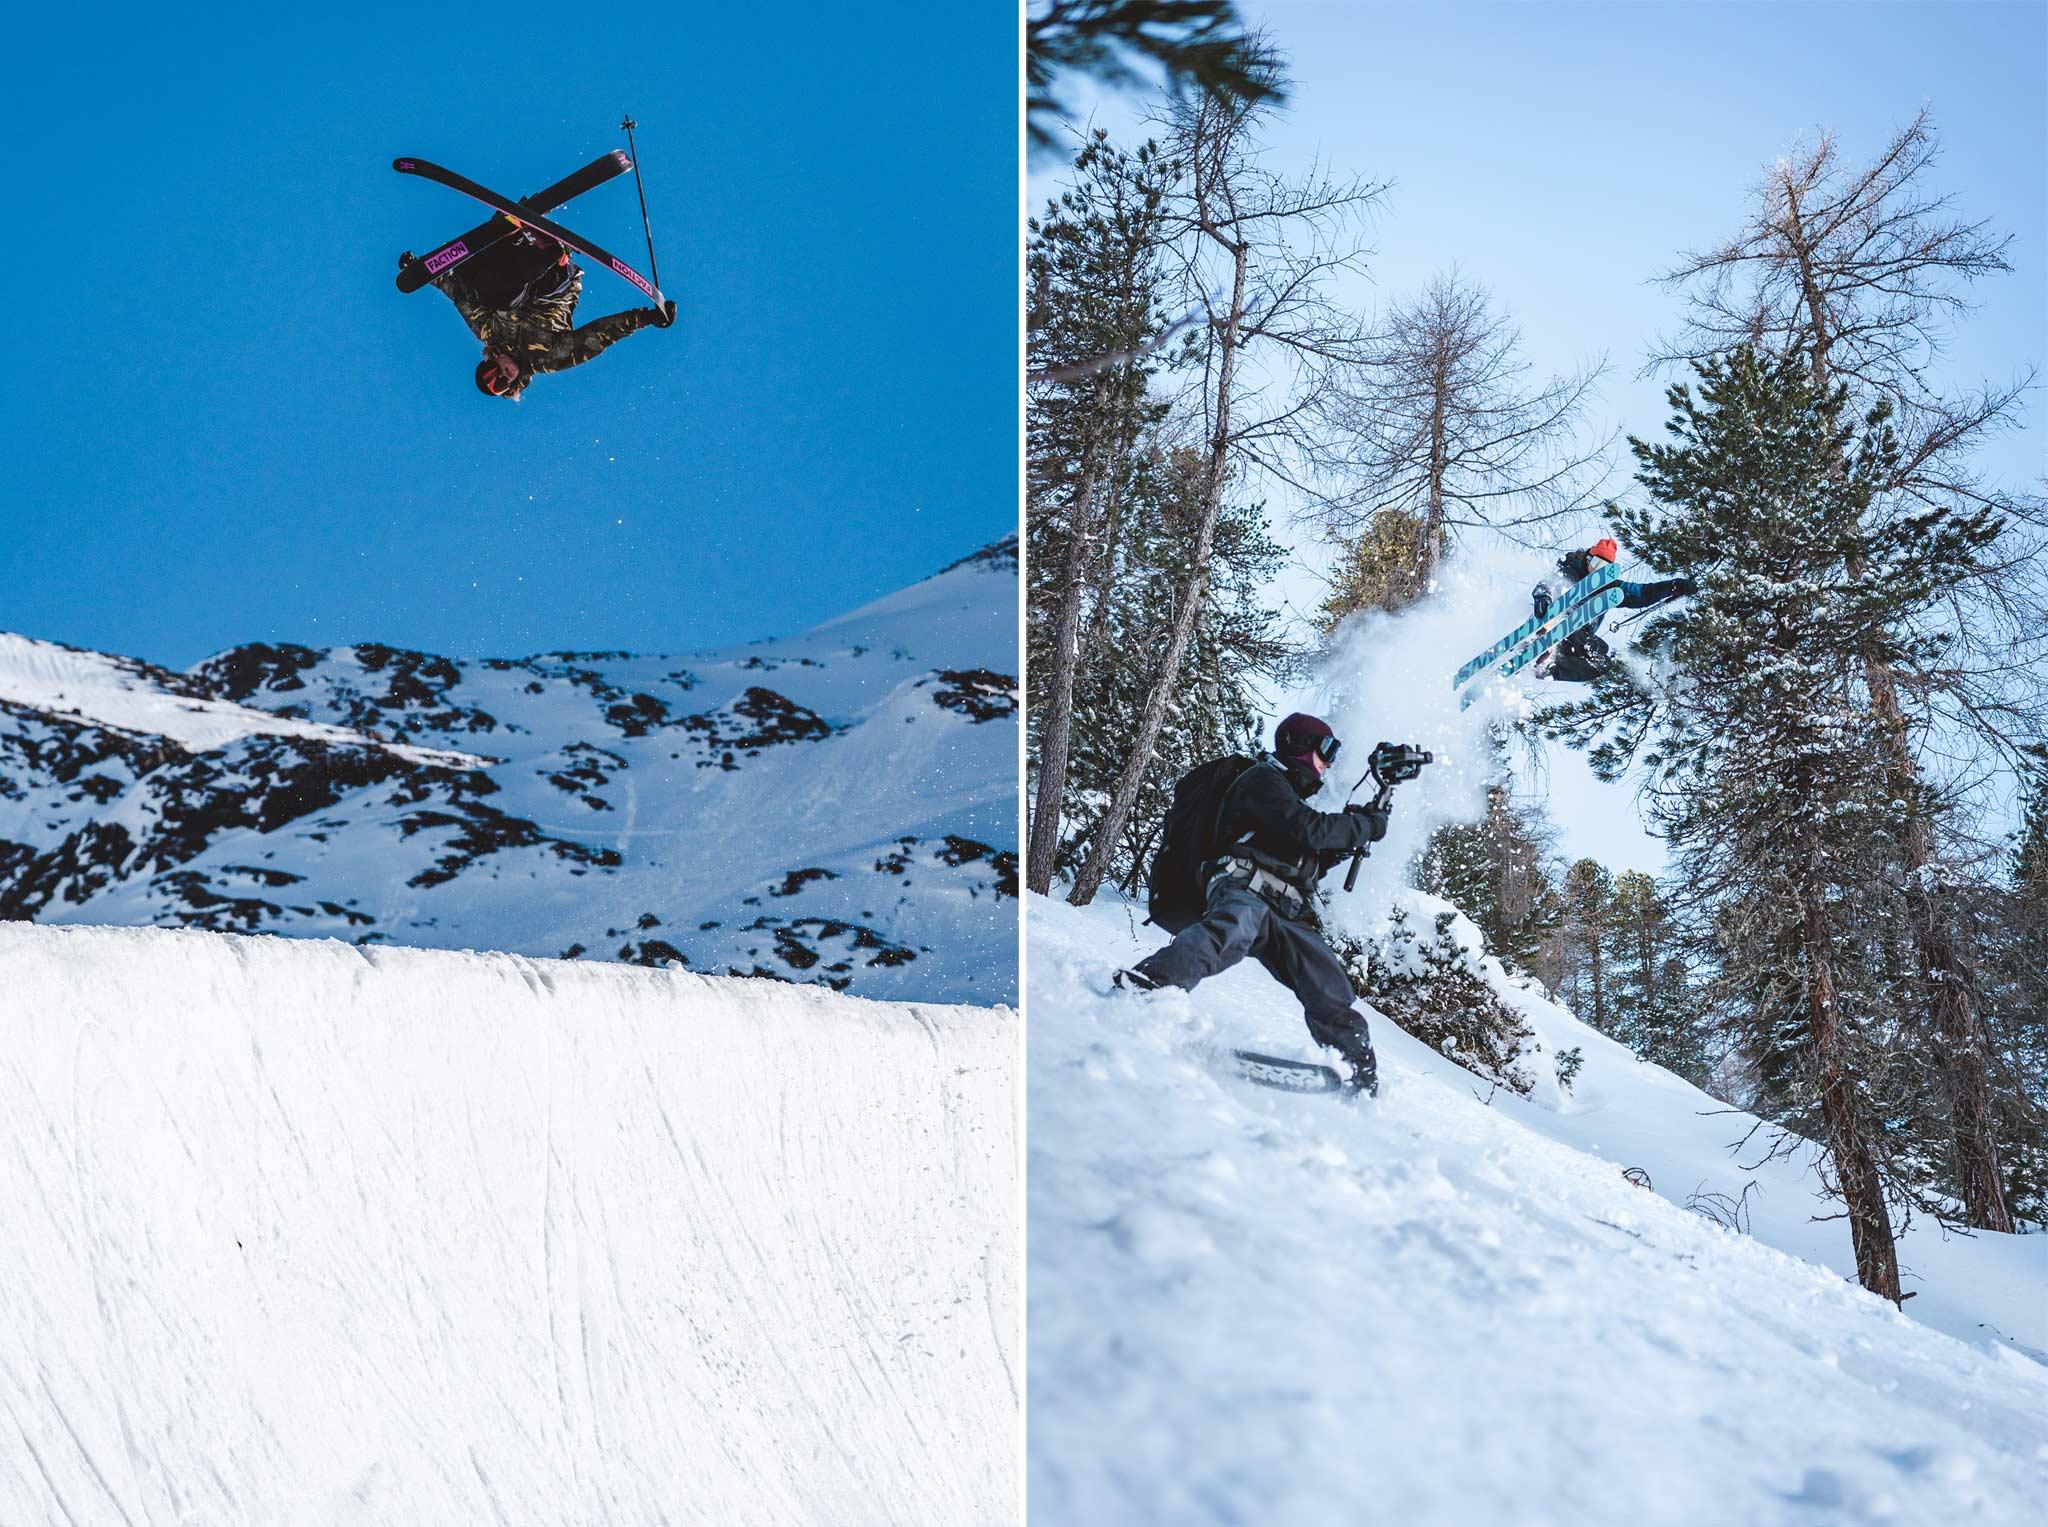 (links) Rider: Antti Ollila - Location: Kühtai - Foto: Jörg Angeli / Prime Skiing (rechts) Rider: Anttu Oikkonen - Location: Österreich - Foto: Jörg Angeli / Prime Skiing